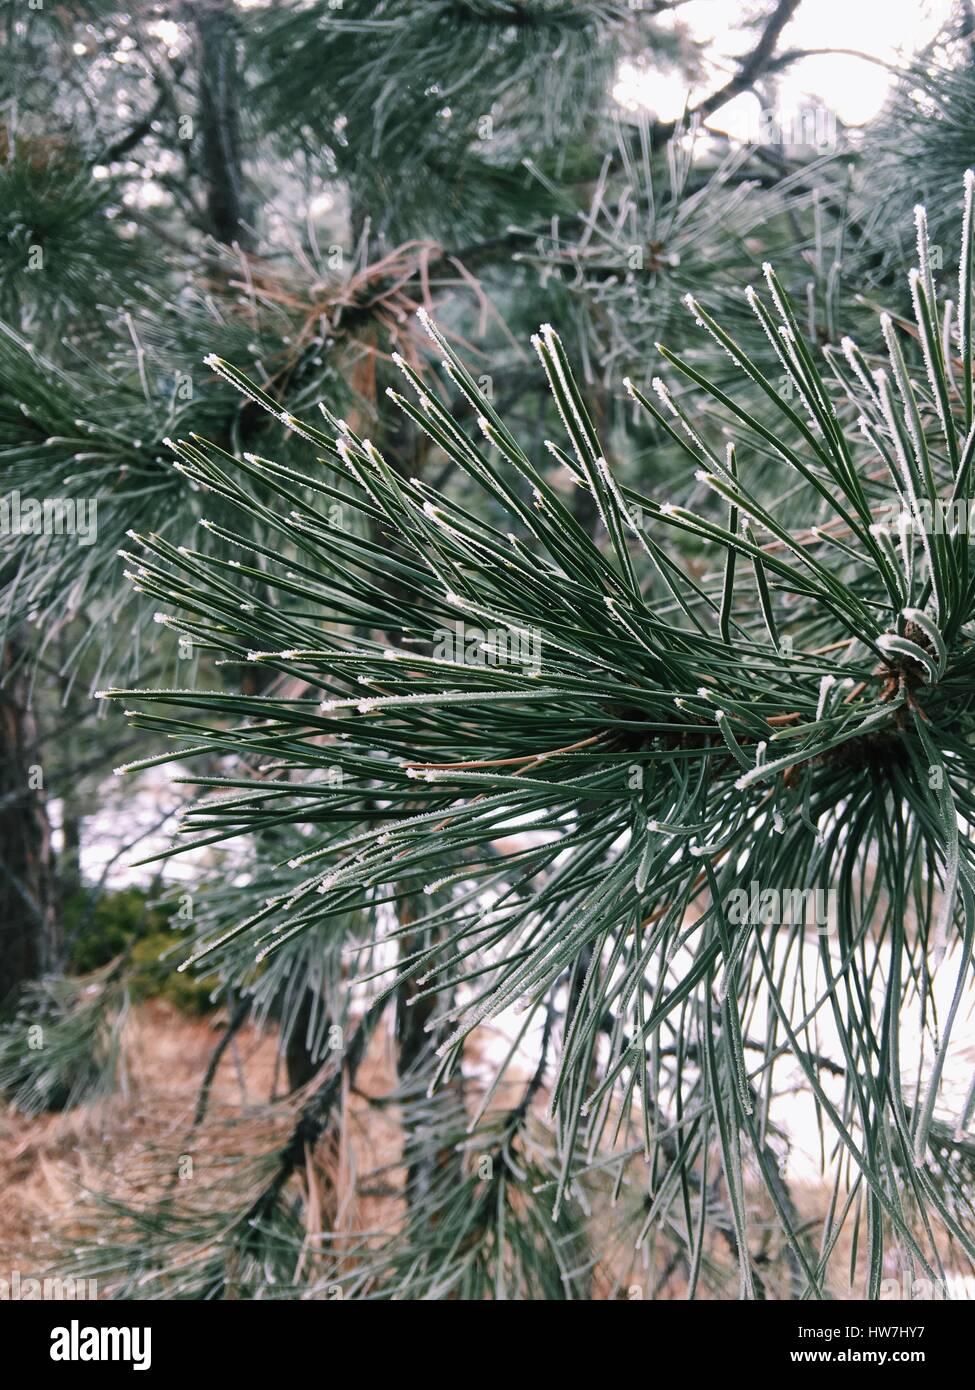 Sonder Explorations - Winter Pine Needles - Stock Image